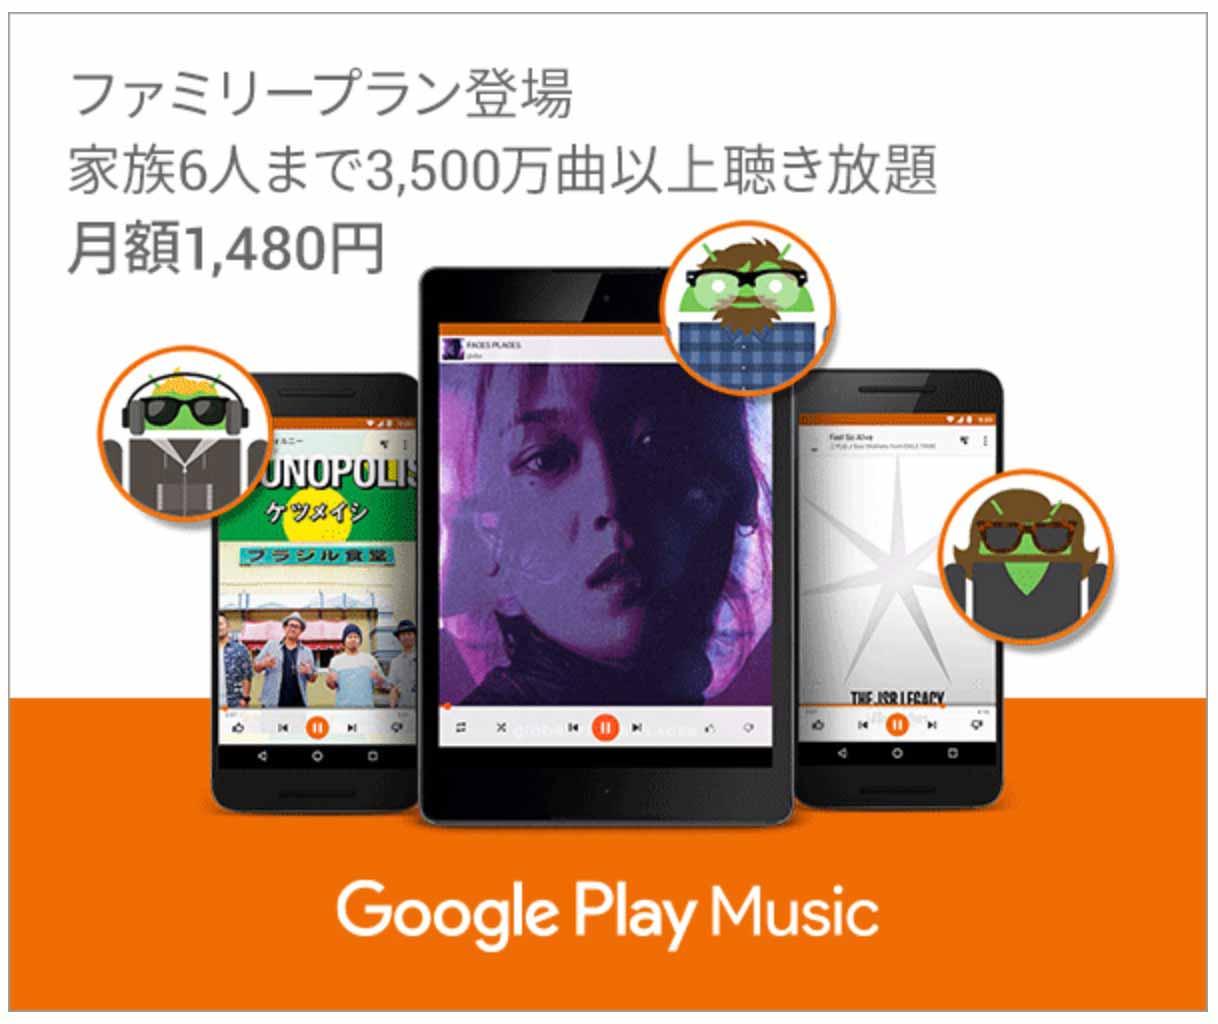 Google、Google Play Musicファミリープランの提供を開始